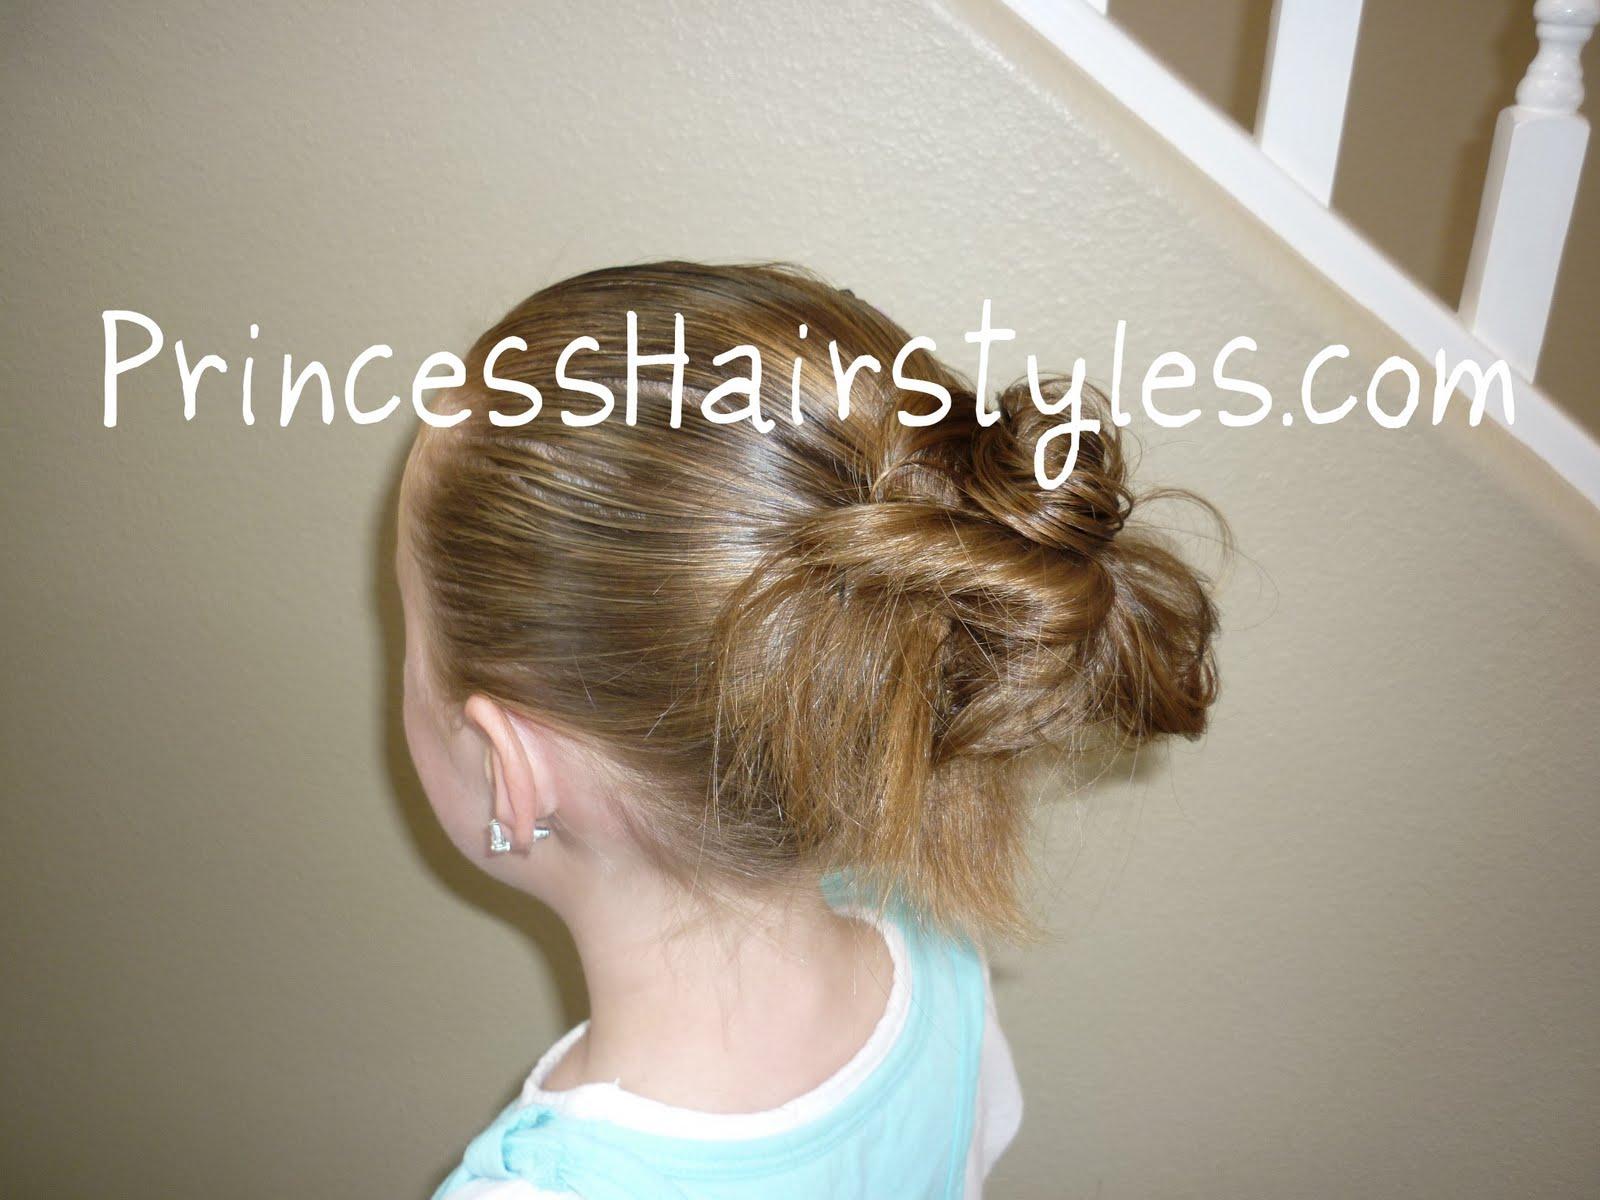 Peachy How To Make A Messy Bun Hairstyles For Girls Princess Hairstyles Short Hairstyles Gunalazisus